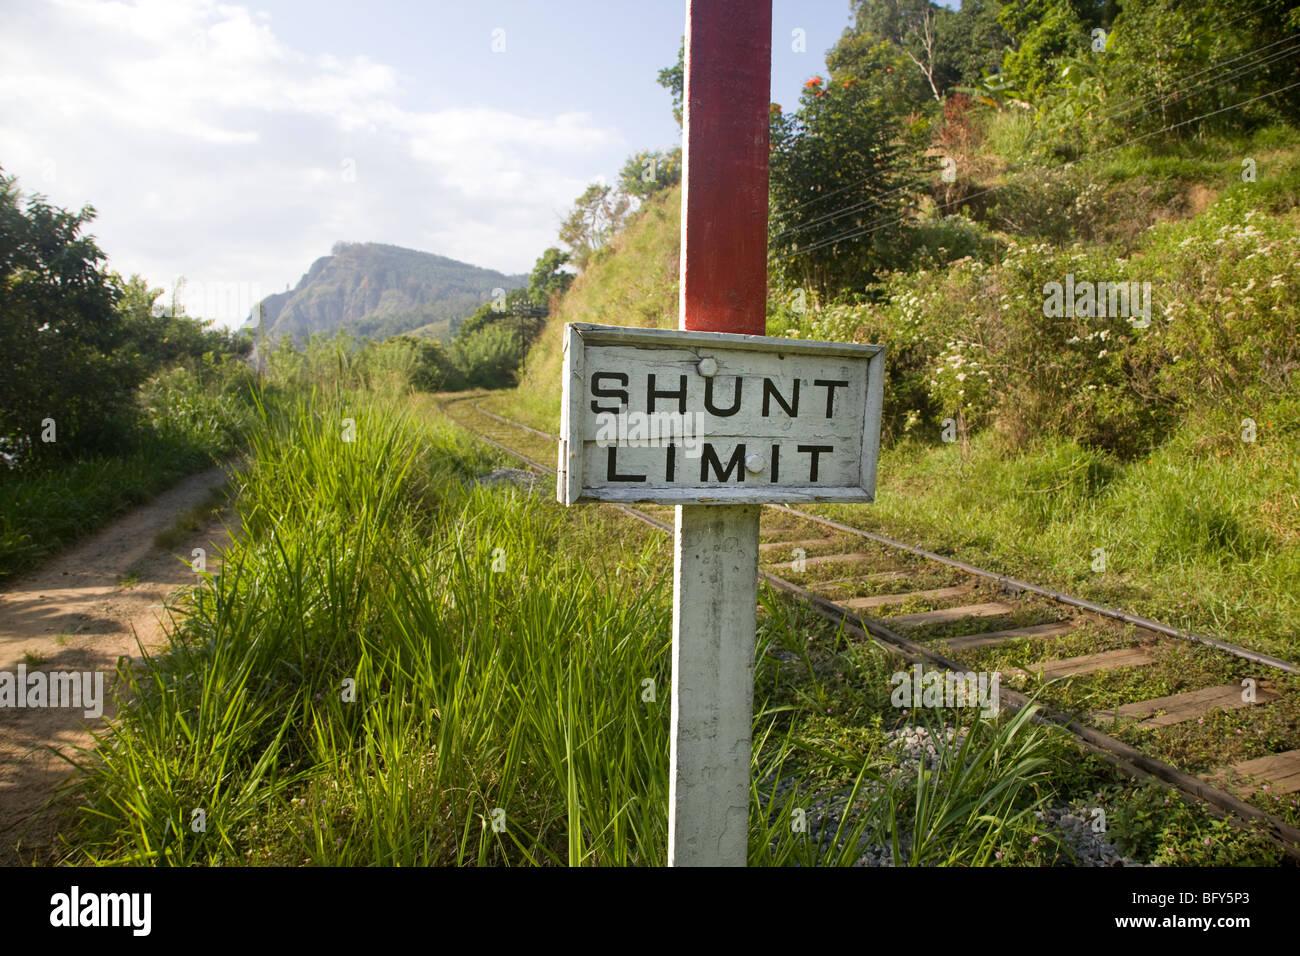 Sri Lanka, The main train east from Colombo into the Hill Country, through Kandy, Nanu Oya, for Nuwara Eliya and - Stock Image